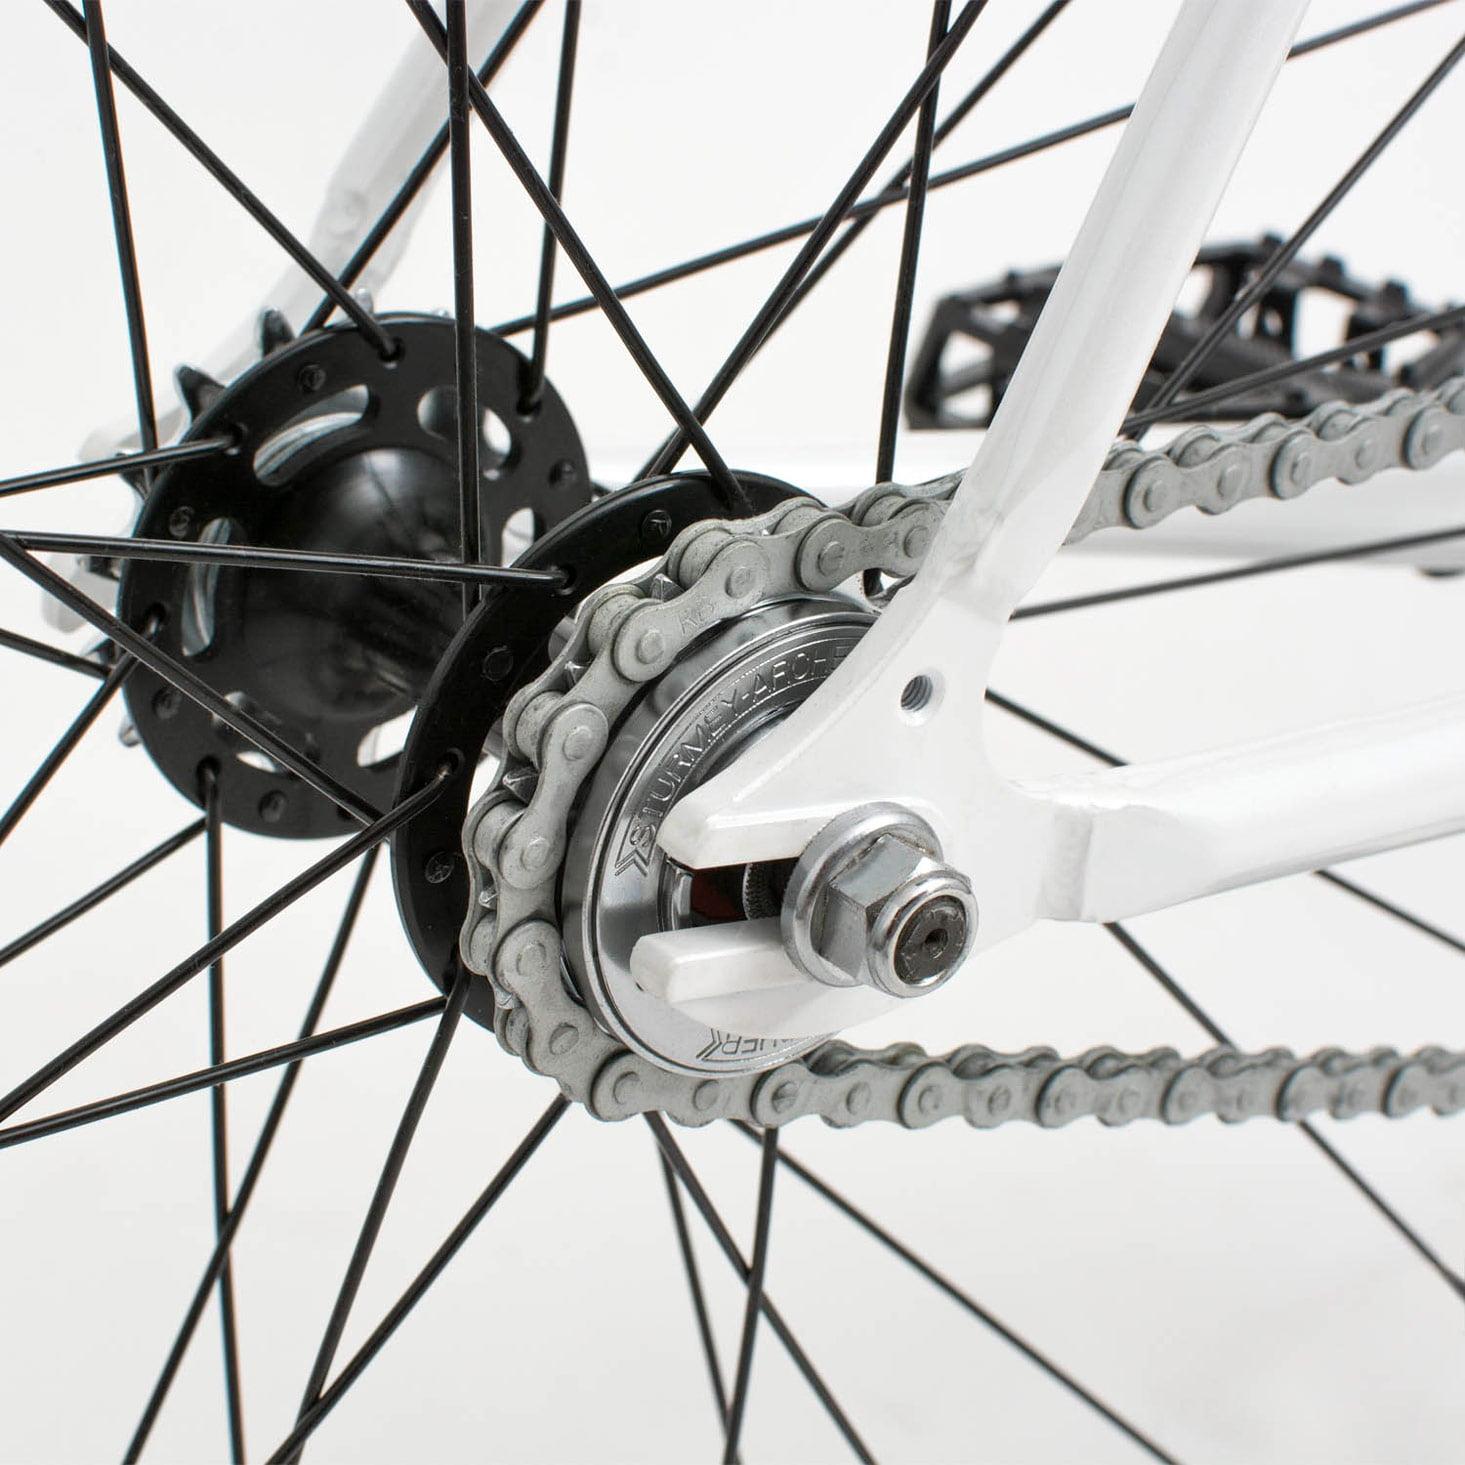 Landyachtz_Spitfire_White_Single_Speed_Bikes_2_DSC4822